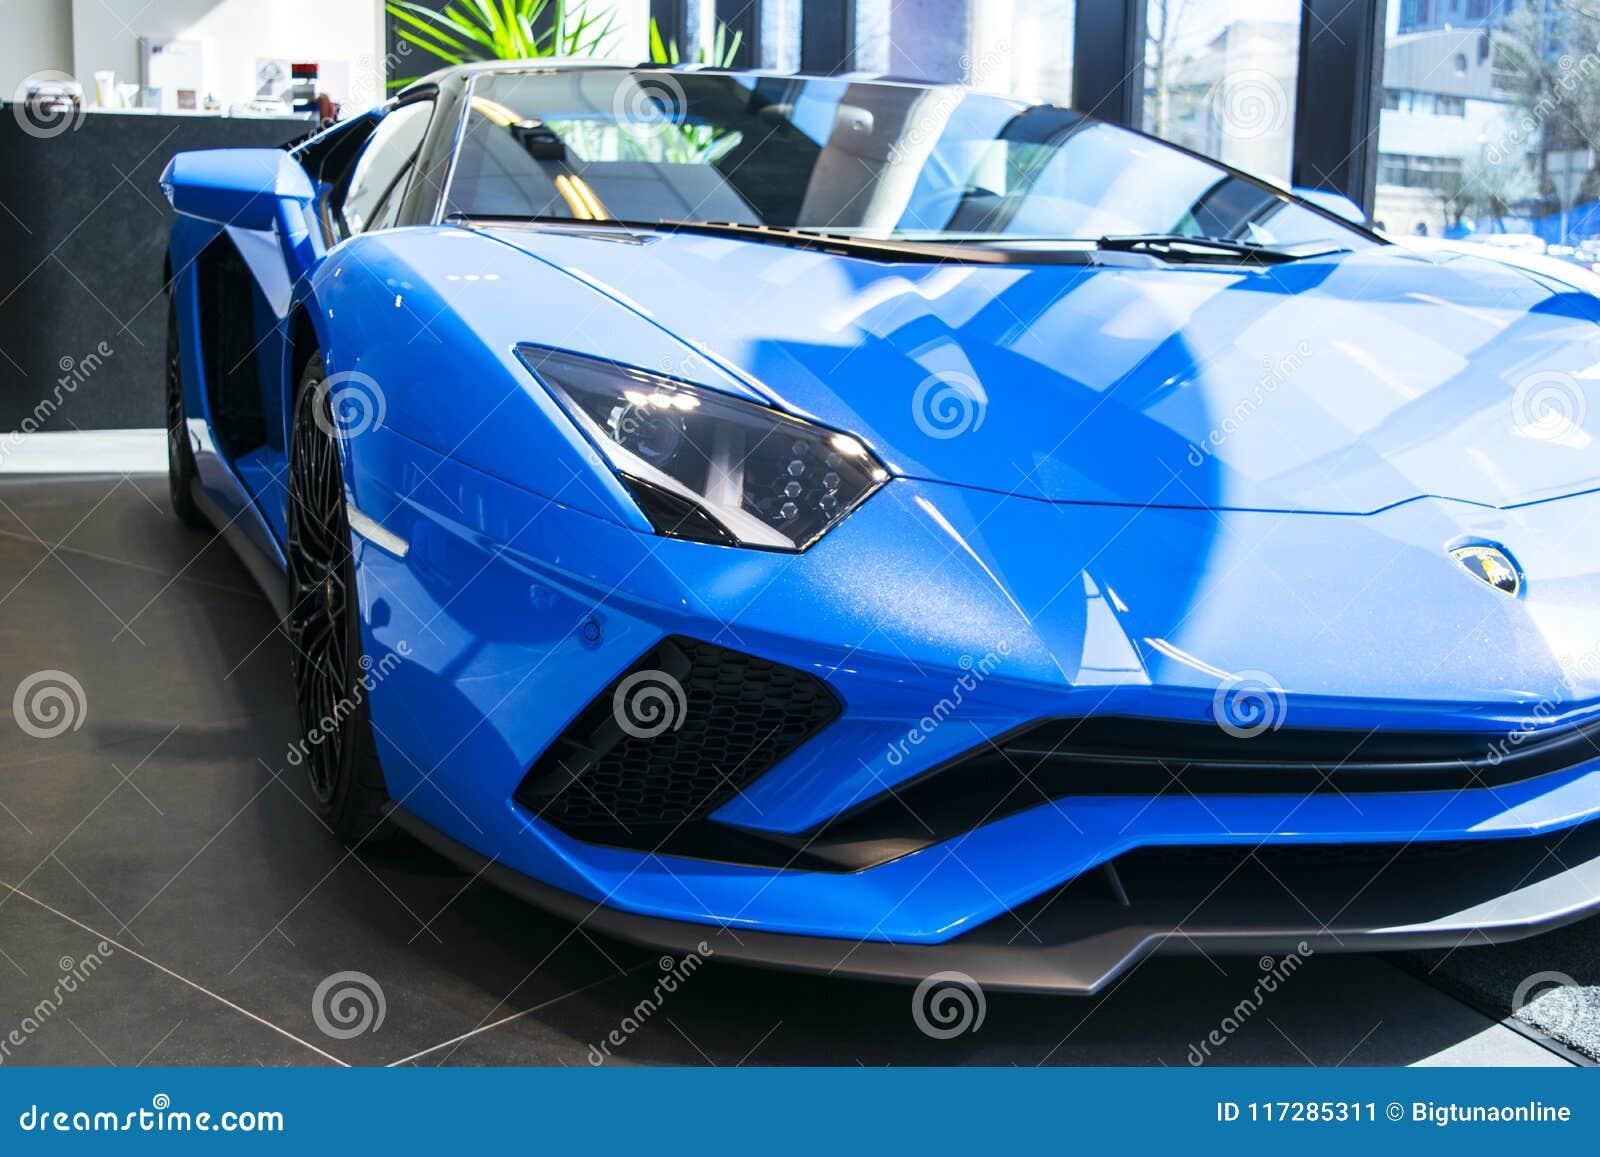 Front View Of A New Lamborghini Aventador S Coupe Headlight Car